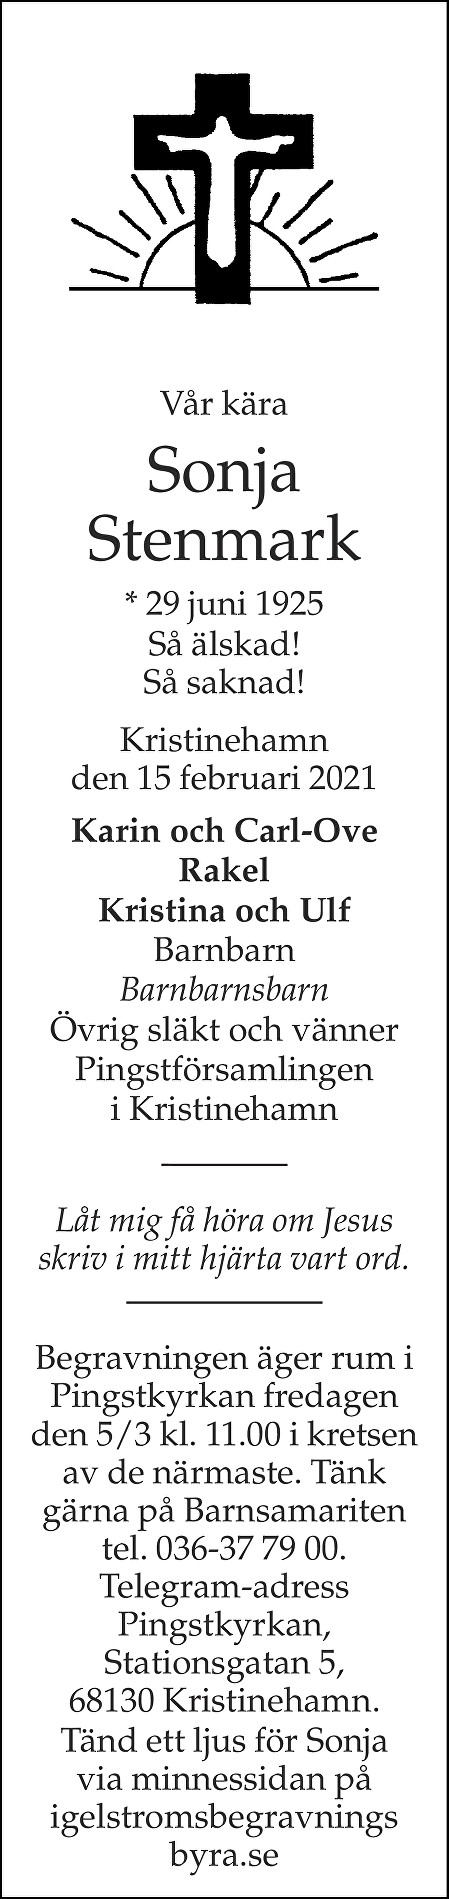 Sonja Stenmark Death notice